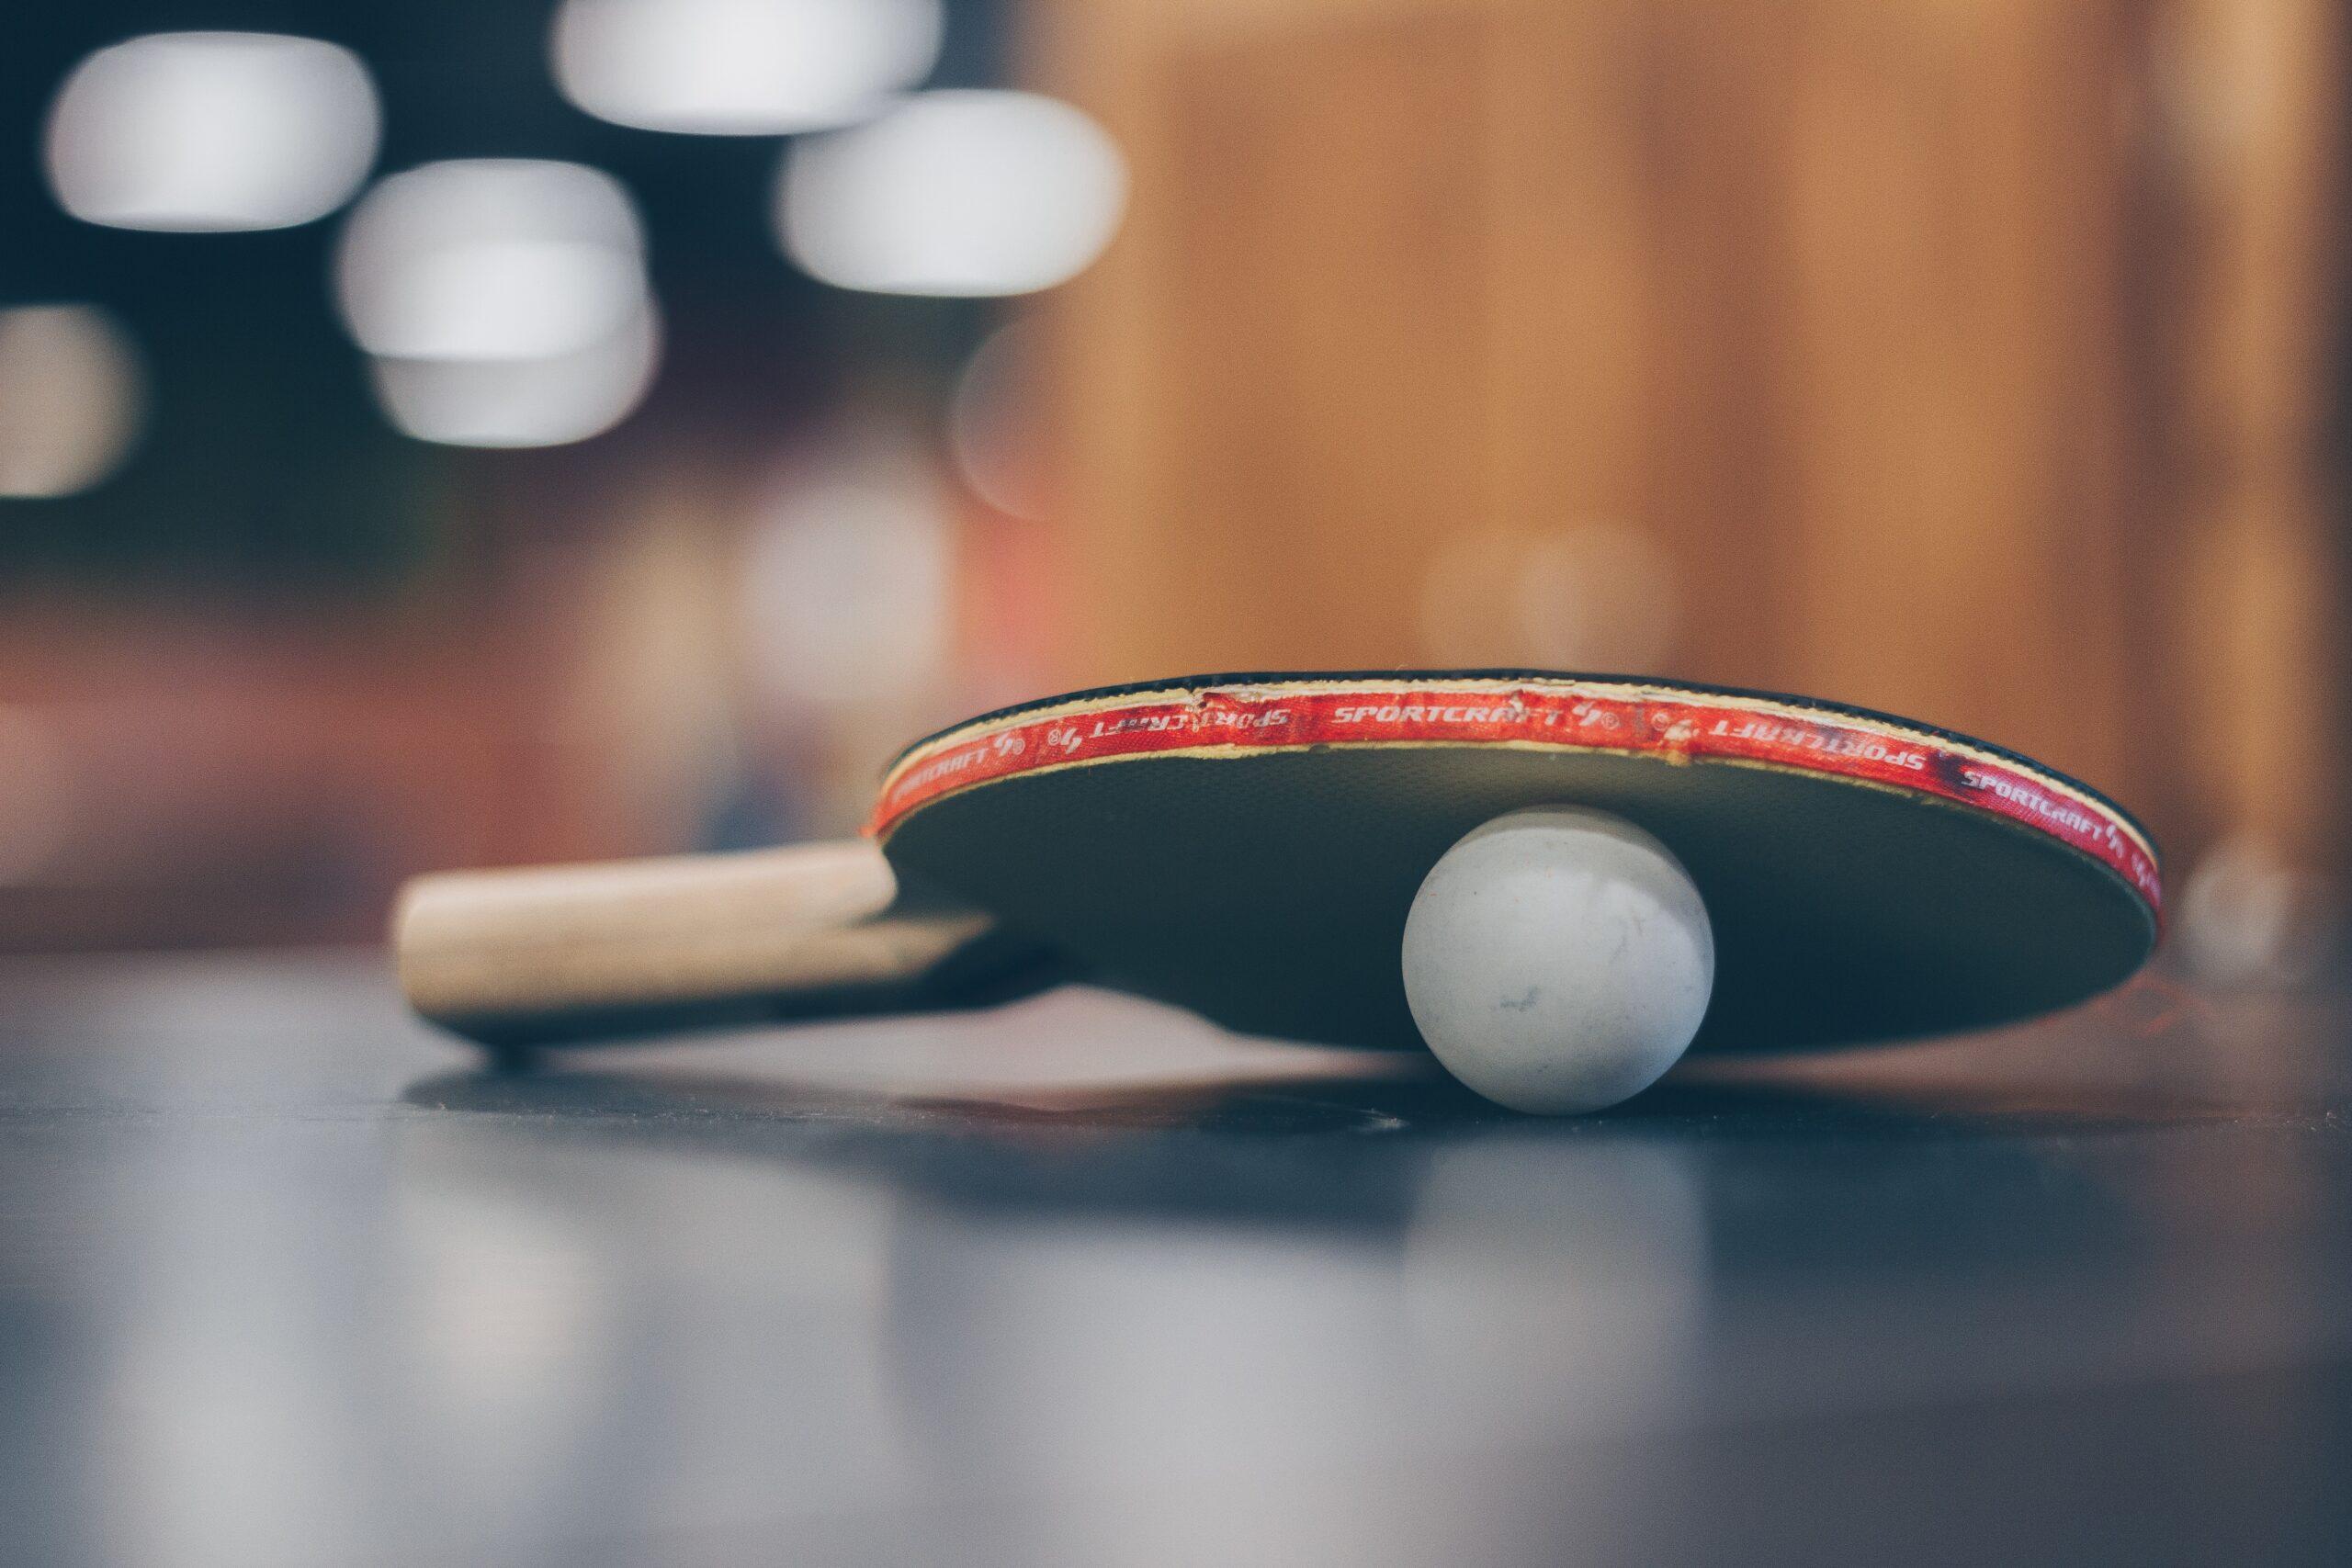 How long do table tennis balls last